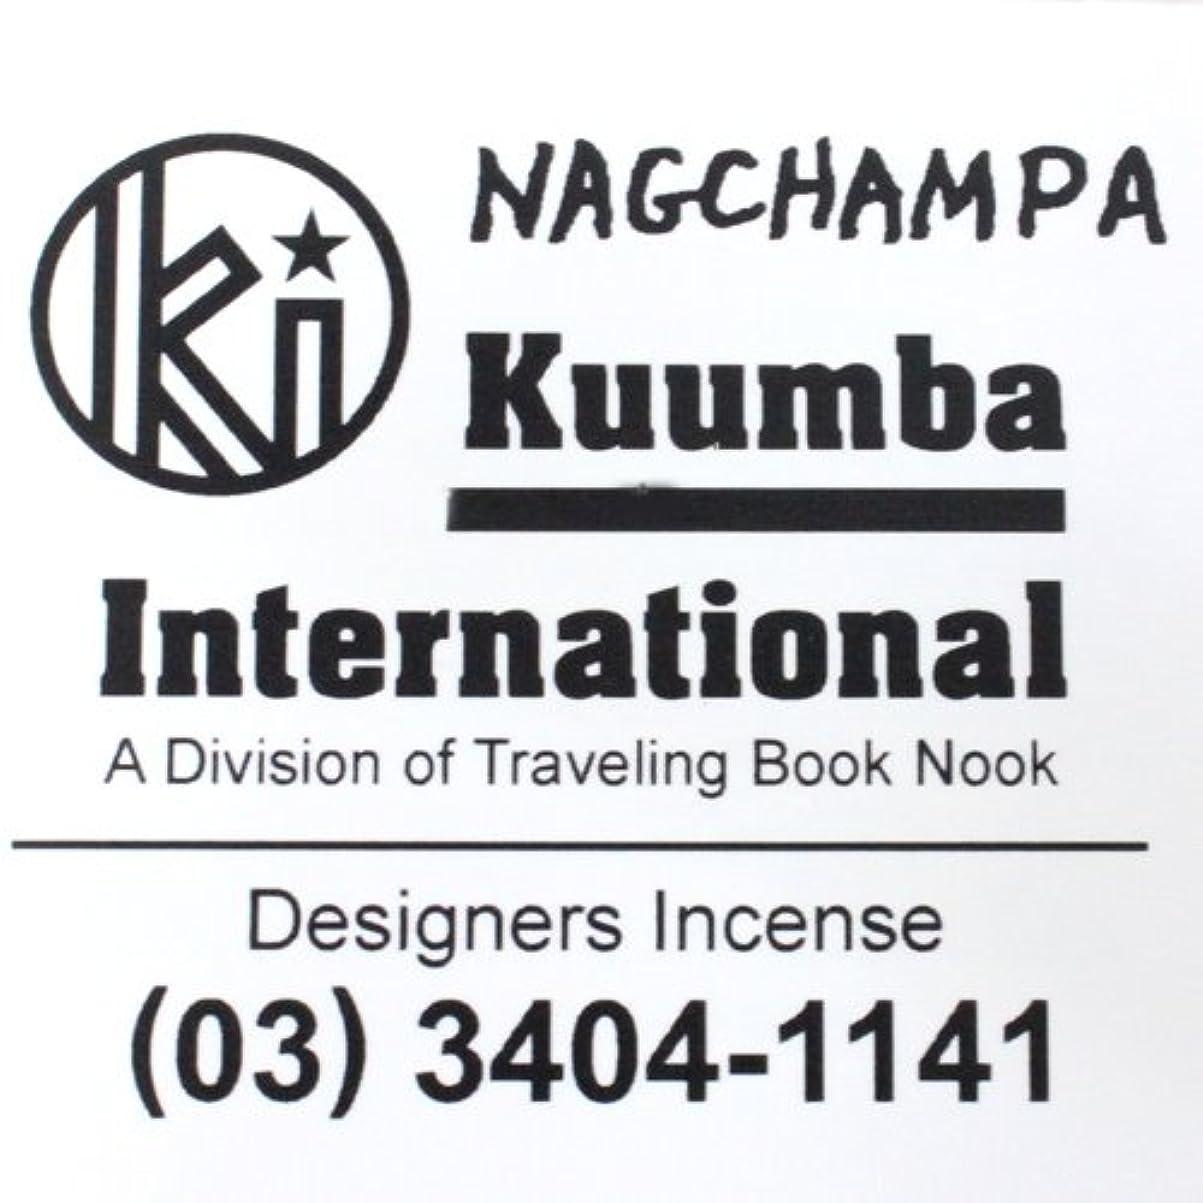 KUUMBA (クンバ)『incense』(NAGCHAMPA) (Regular size)